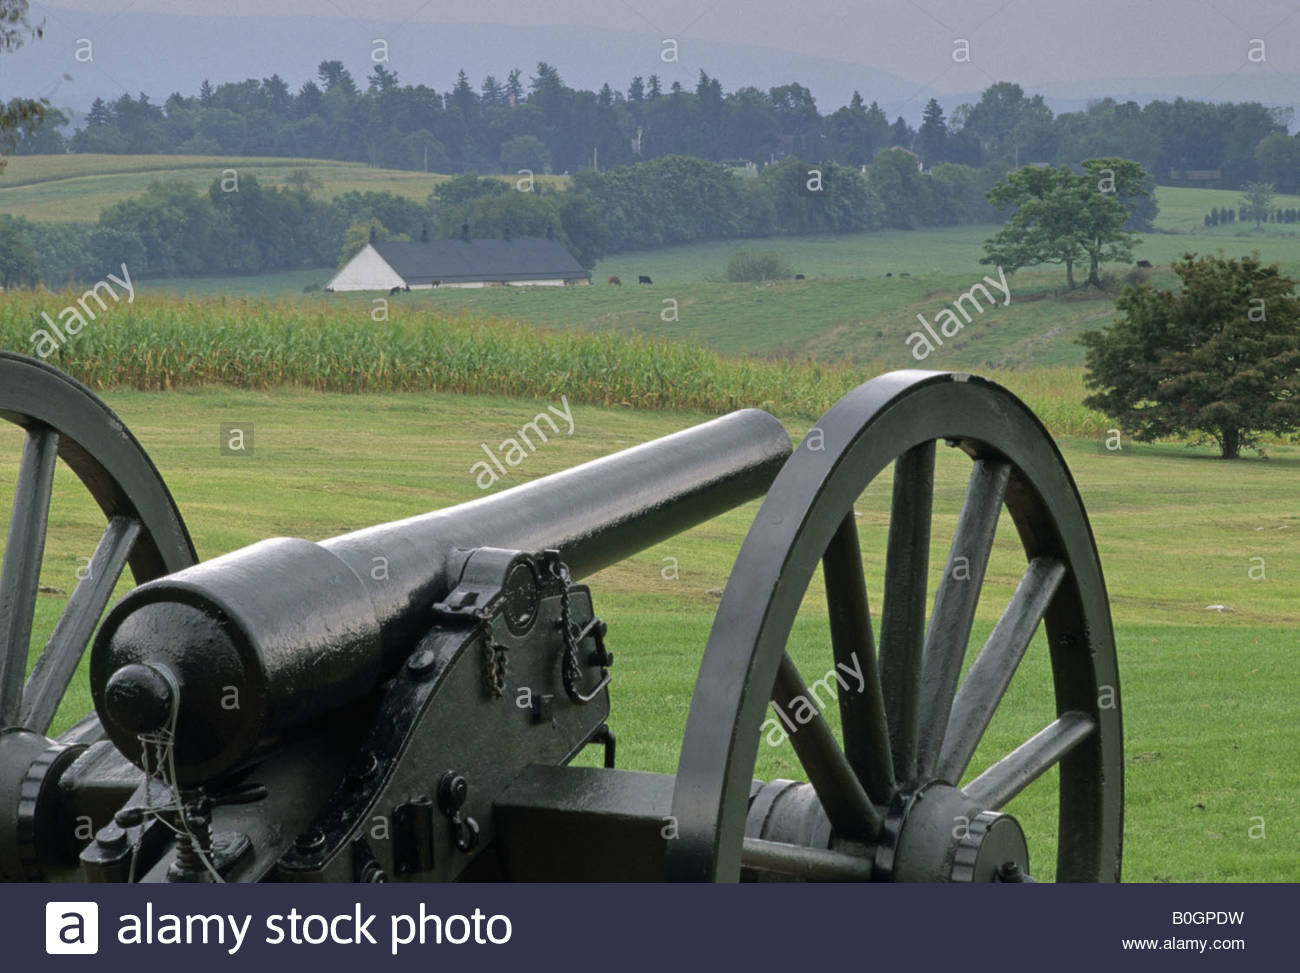 Cañón de la guerra civil en Antietam National Battlefield, Sharpsburg Maryland, EE.UU. Foto de stock